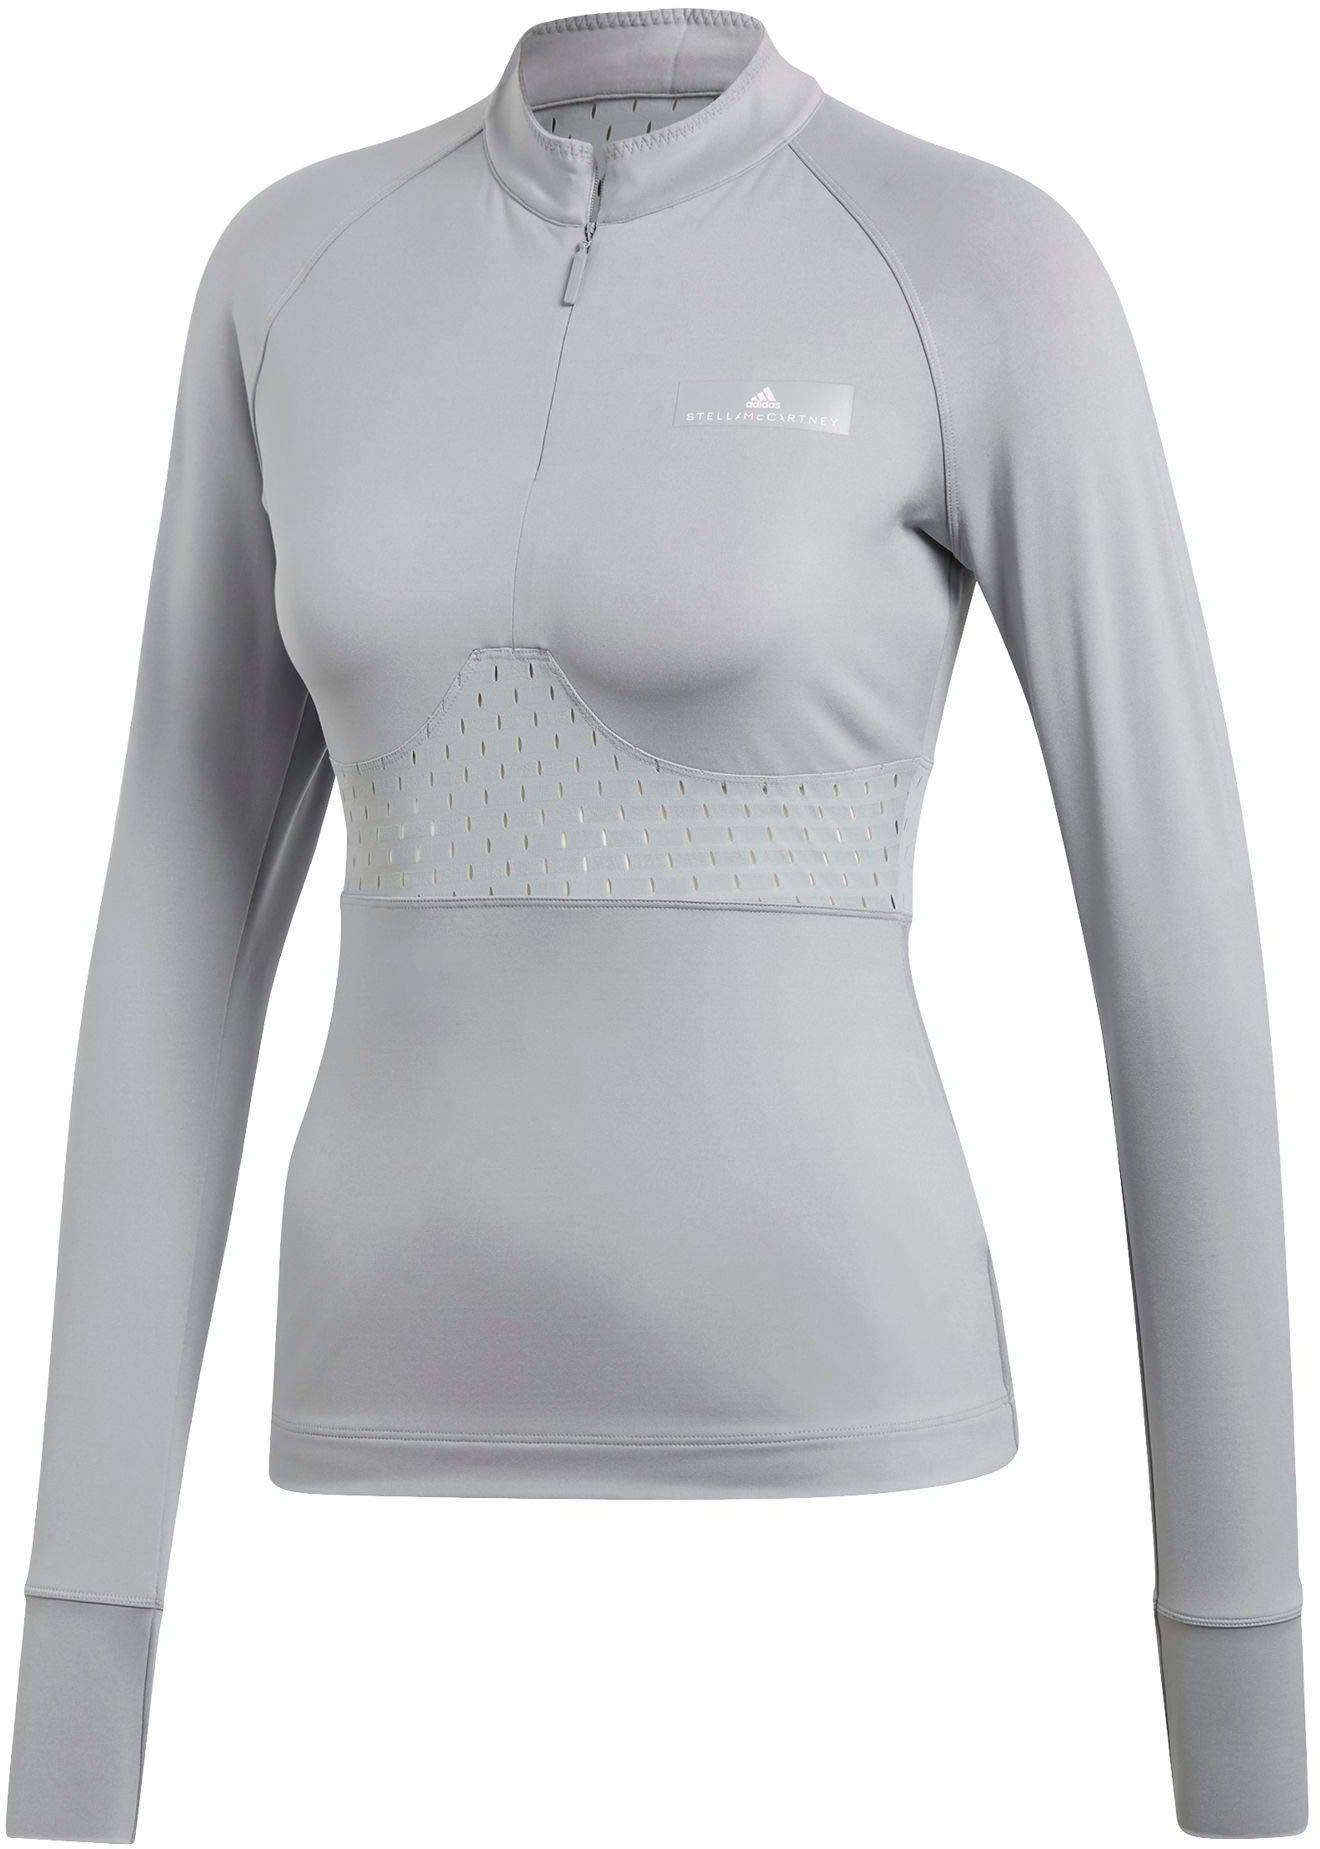 adidas Damska koszulka Stella Mccartney Ls szary Midgre L